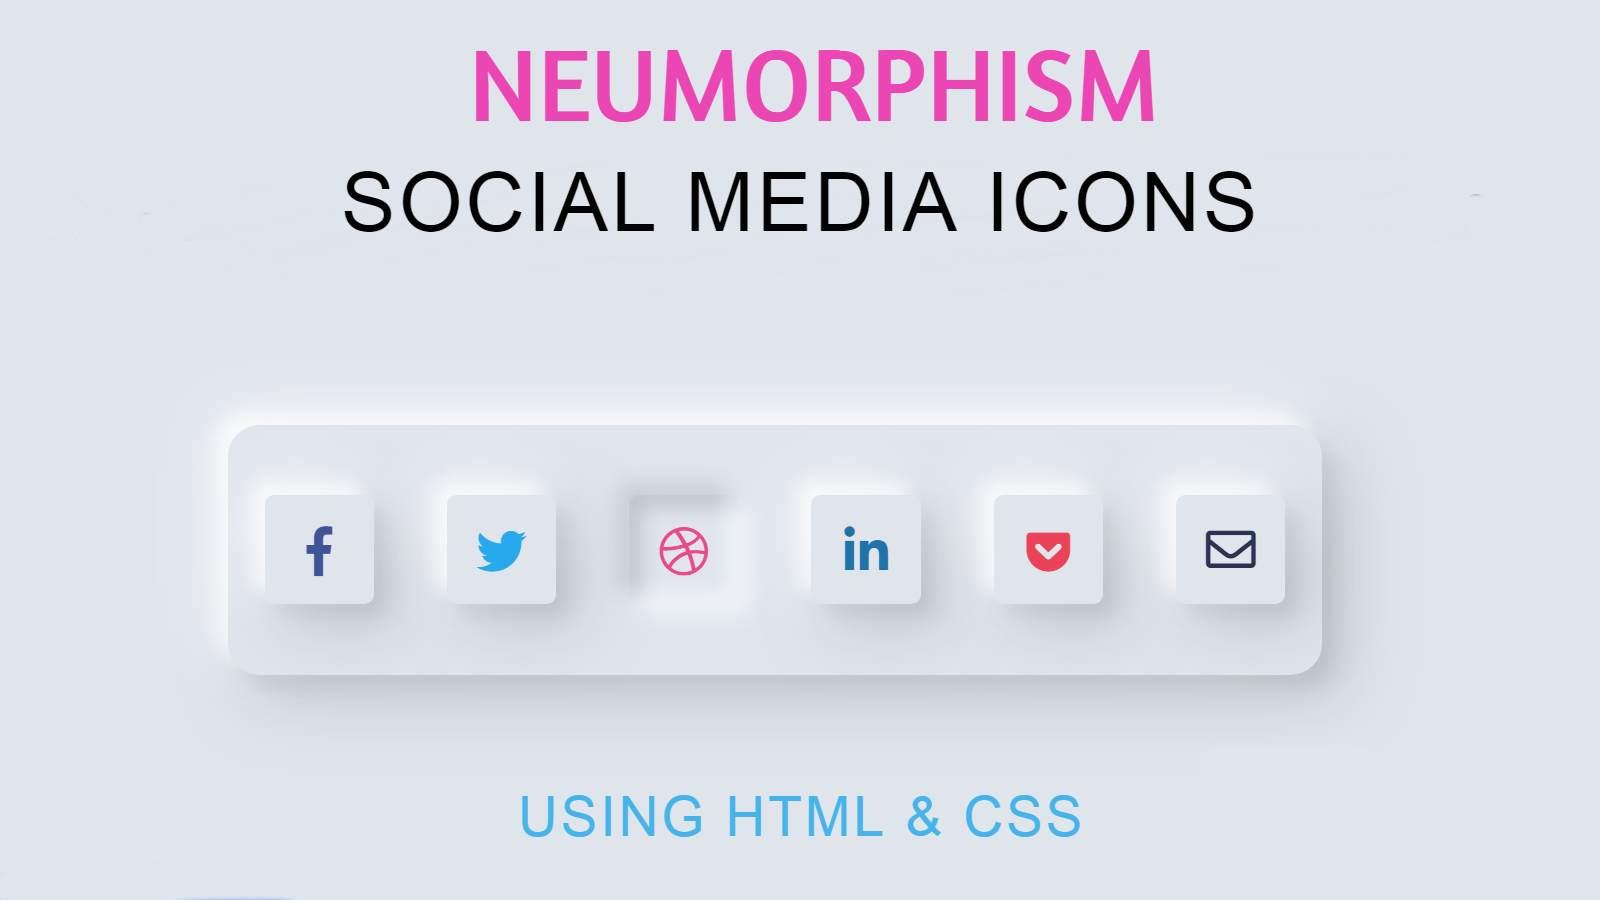 Amazing Neumorphism Social Media Button Using HTML & CSS